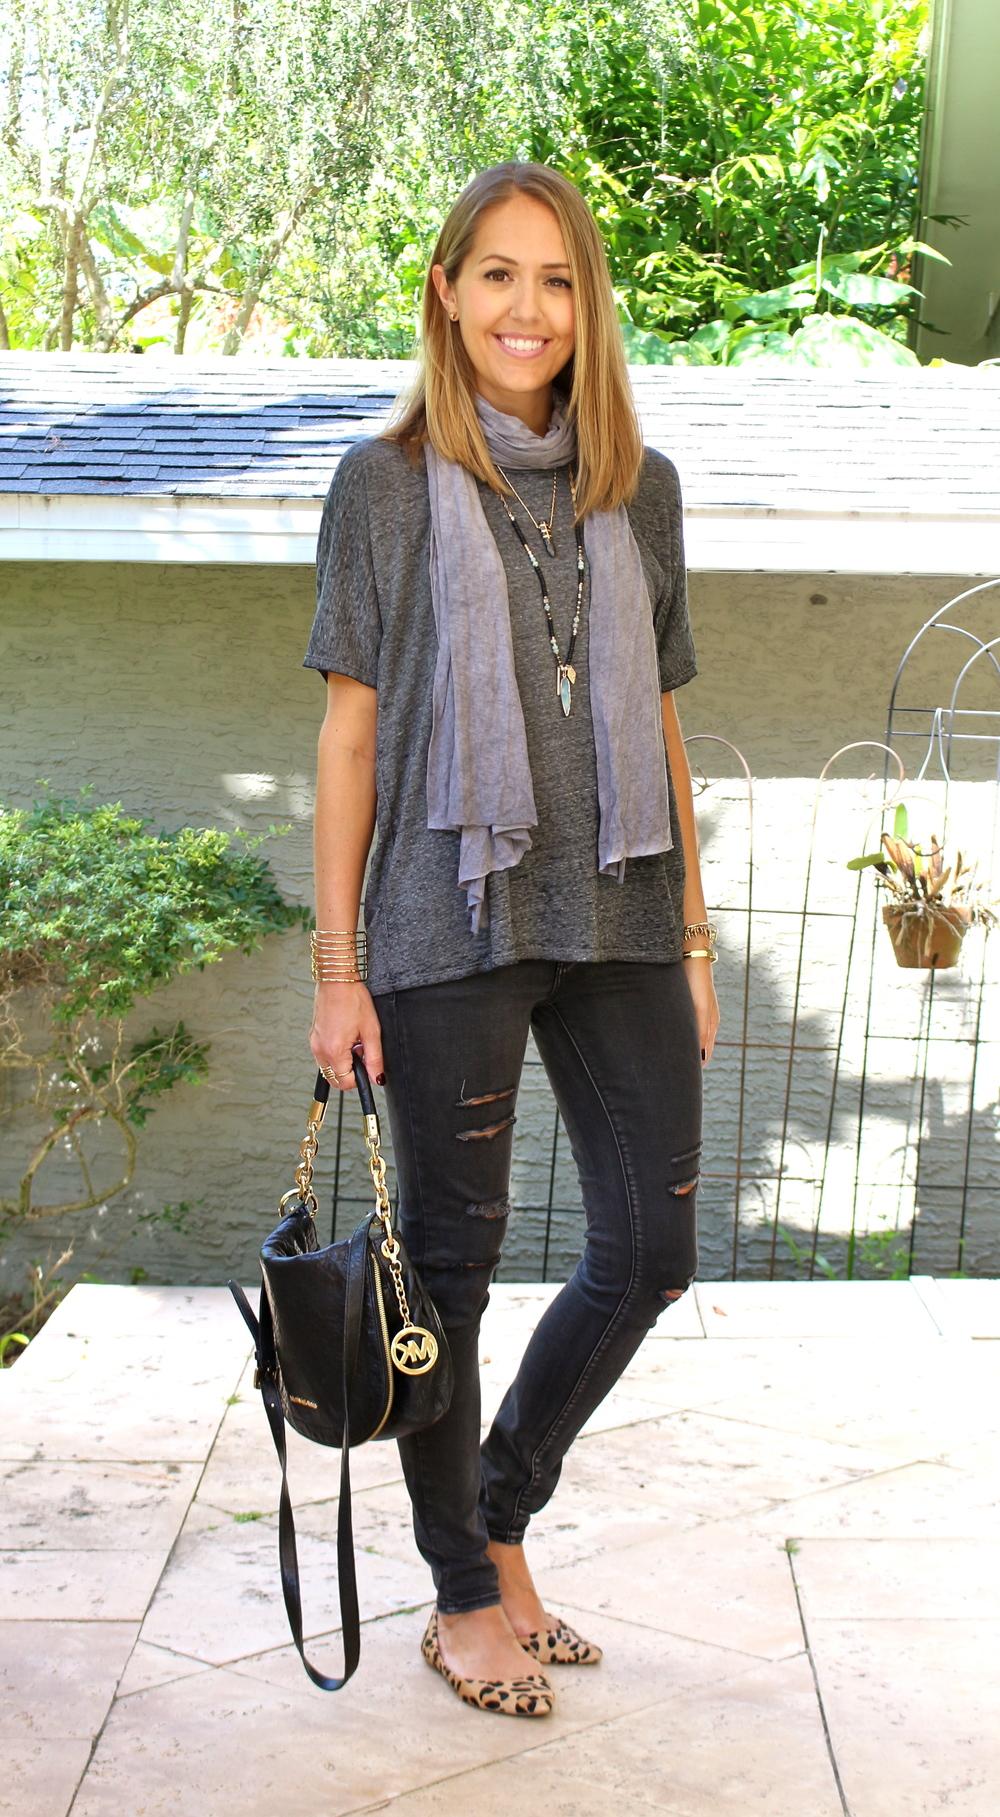 Gray tee, black jeans, leopard flats